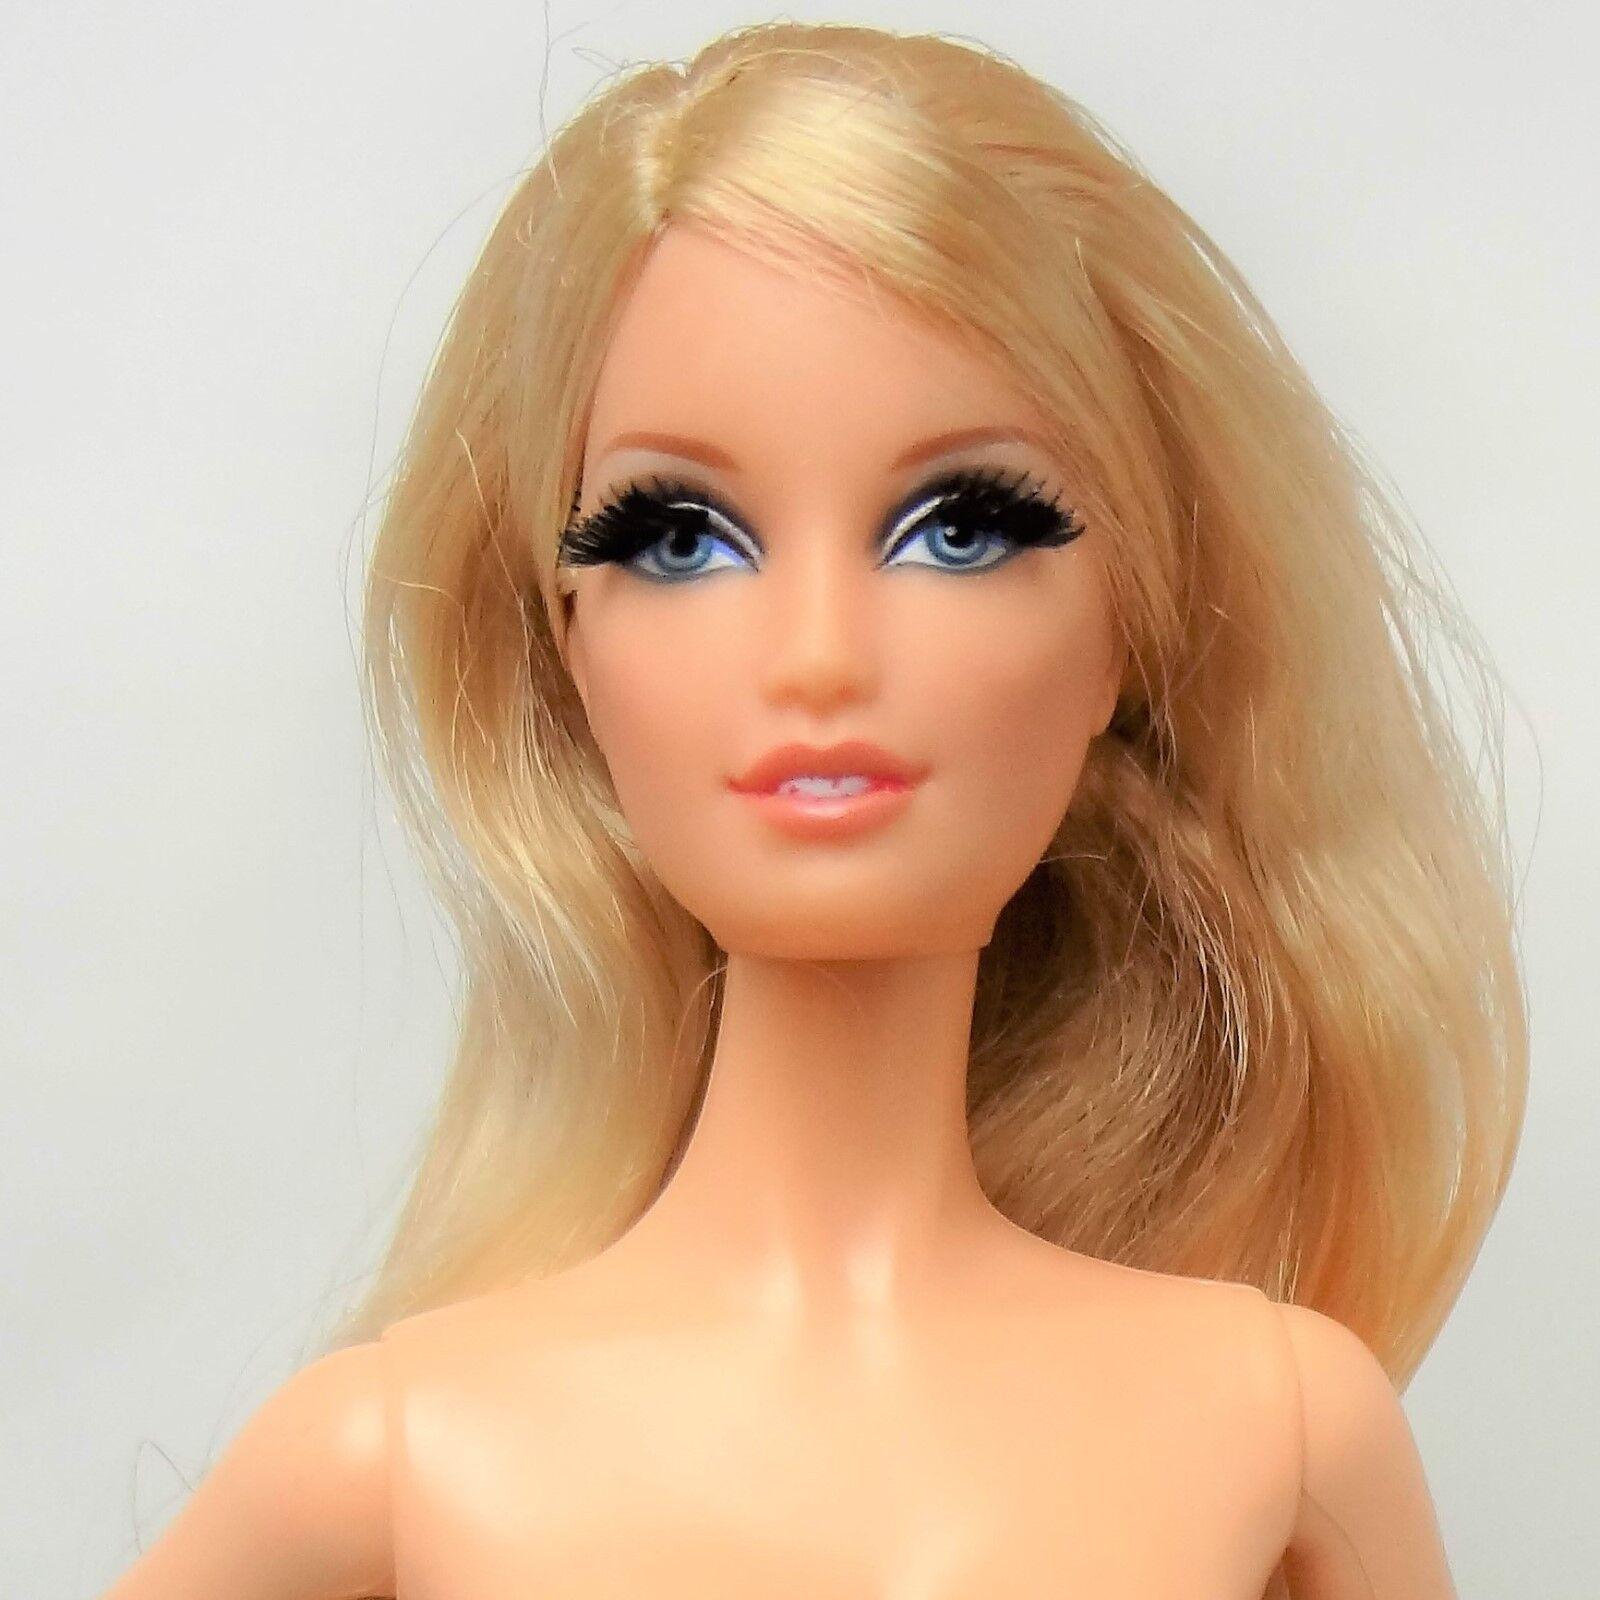 Nude Barbie The Look City Shopper Blonde Model Muse Doll Lara sculpt 2013